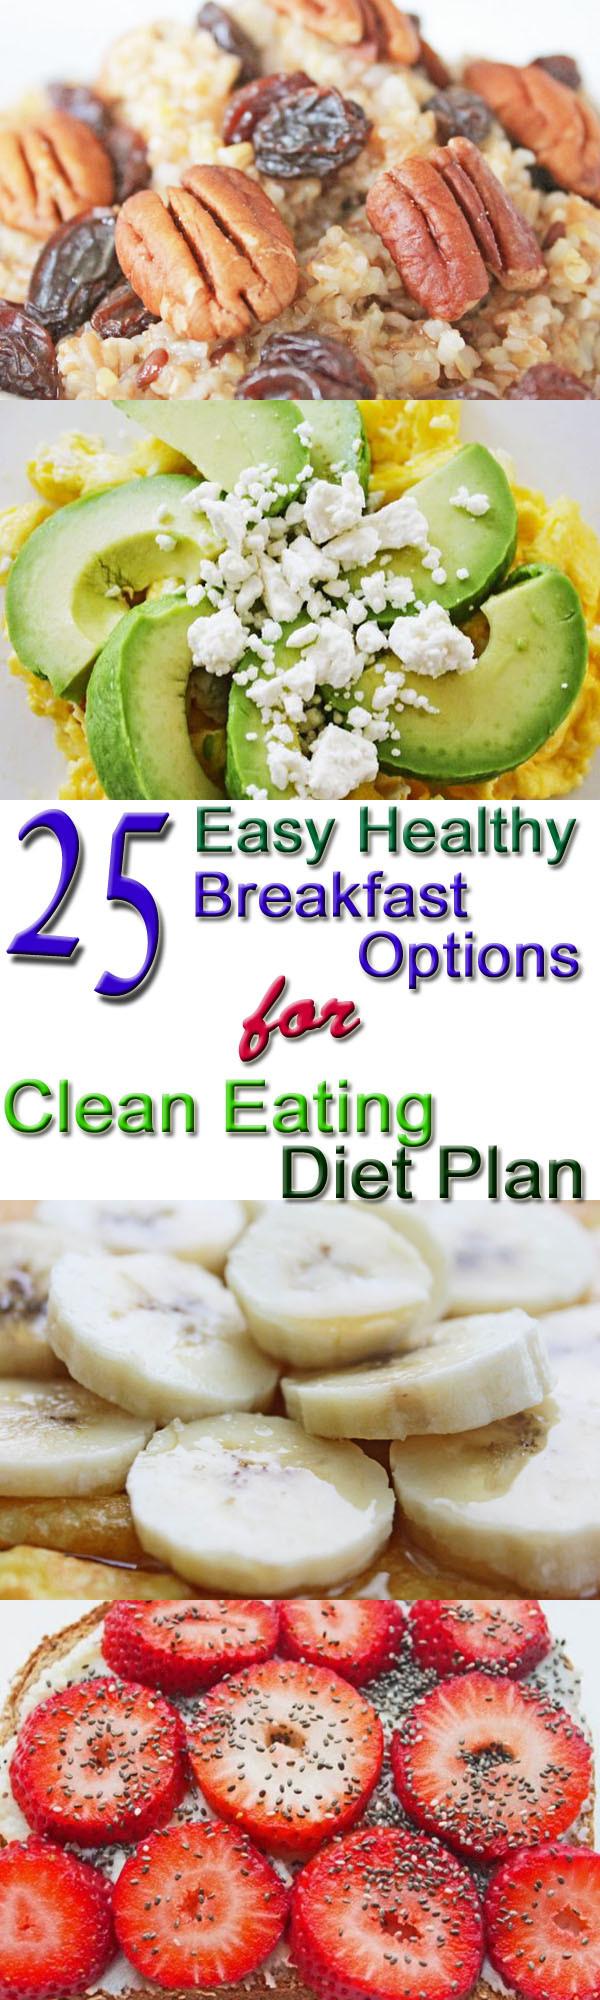 Healthy Diet Breakfast Recipes  25 Healthy Breakfast Options